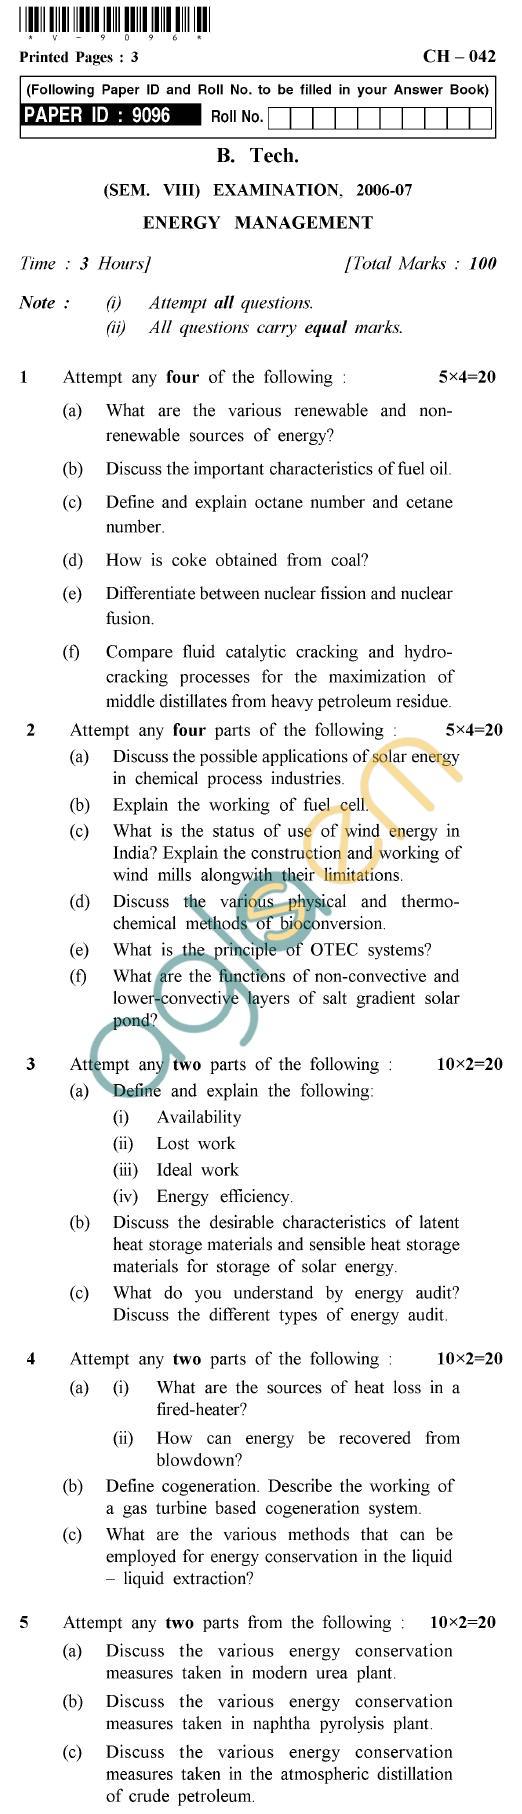 UPTU B.Tech Question Papers -CH-042 - Energy Management